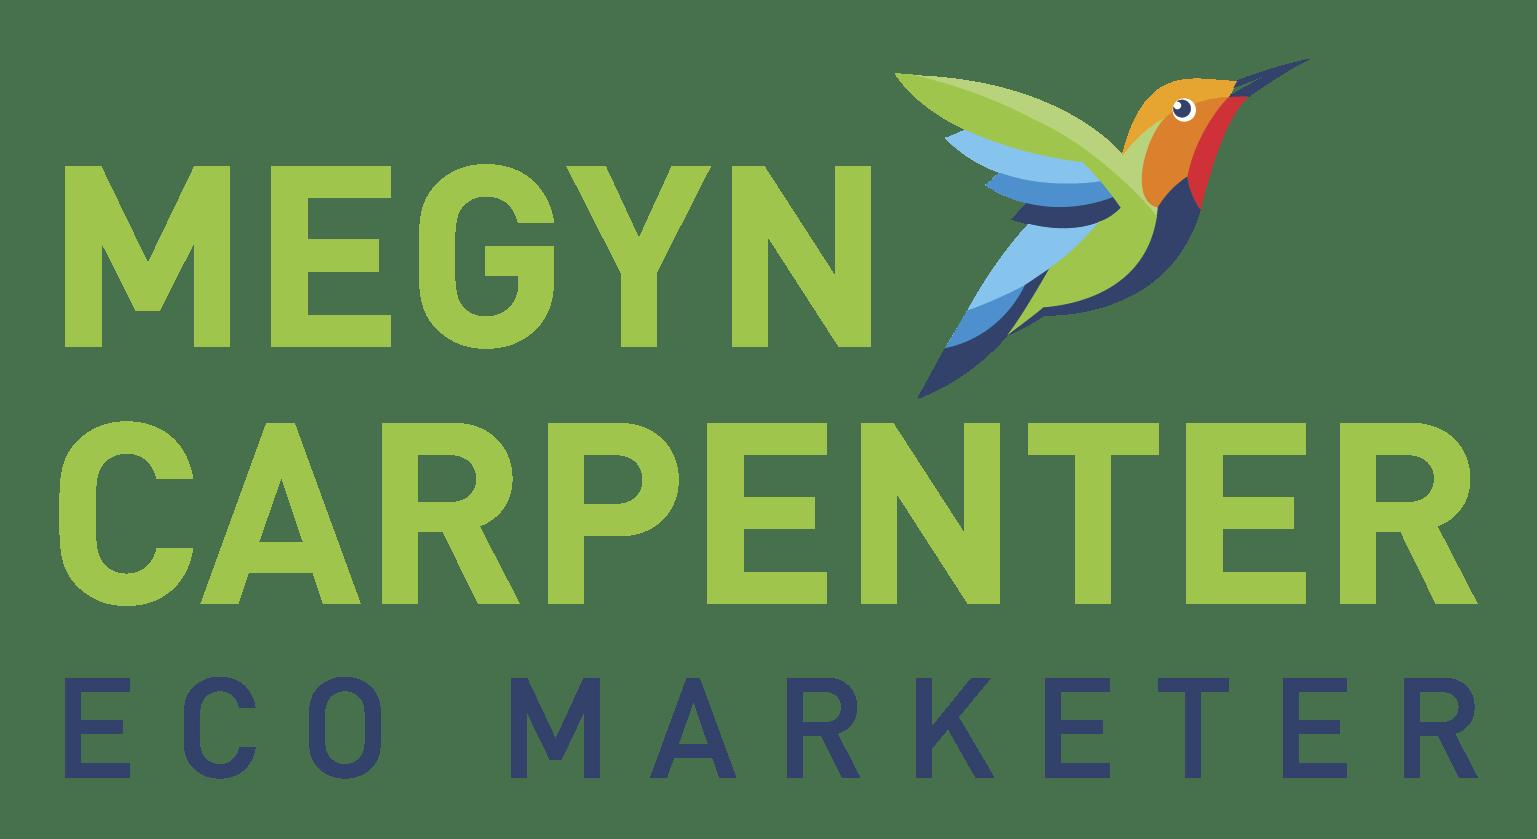 Megyn Carpenter, Eco Marketer